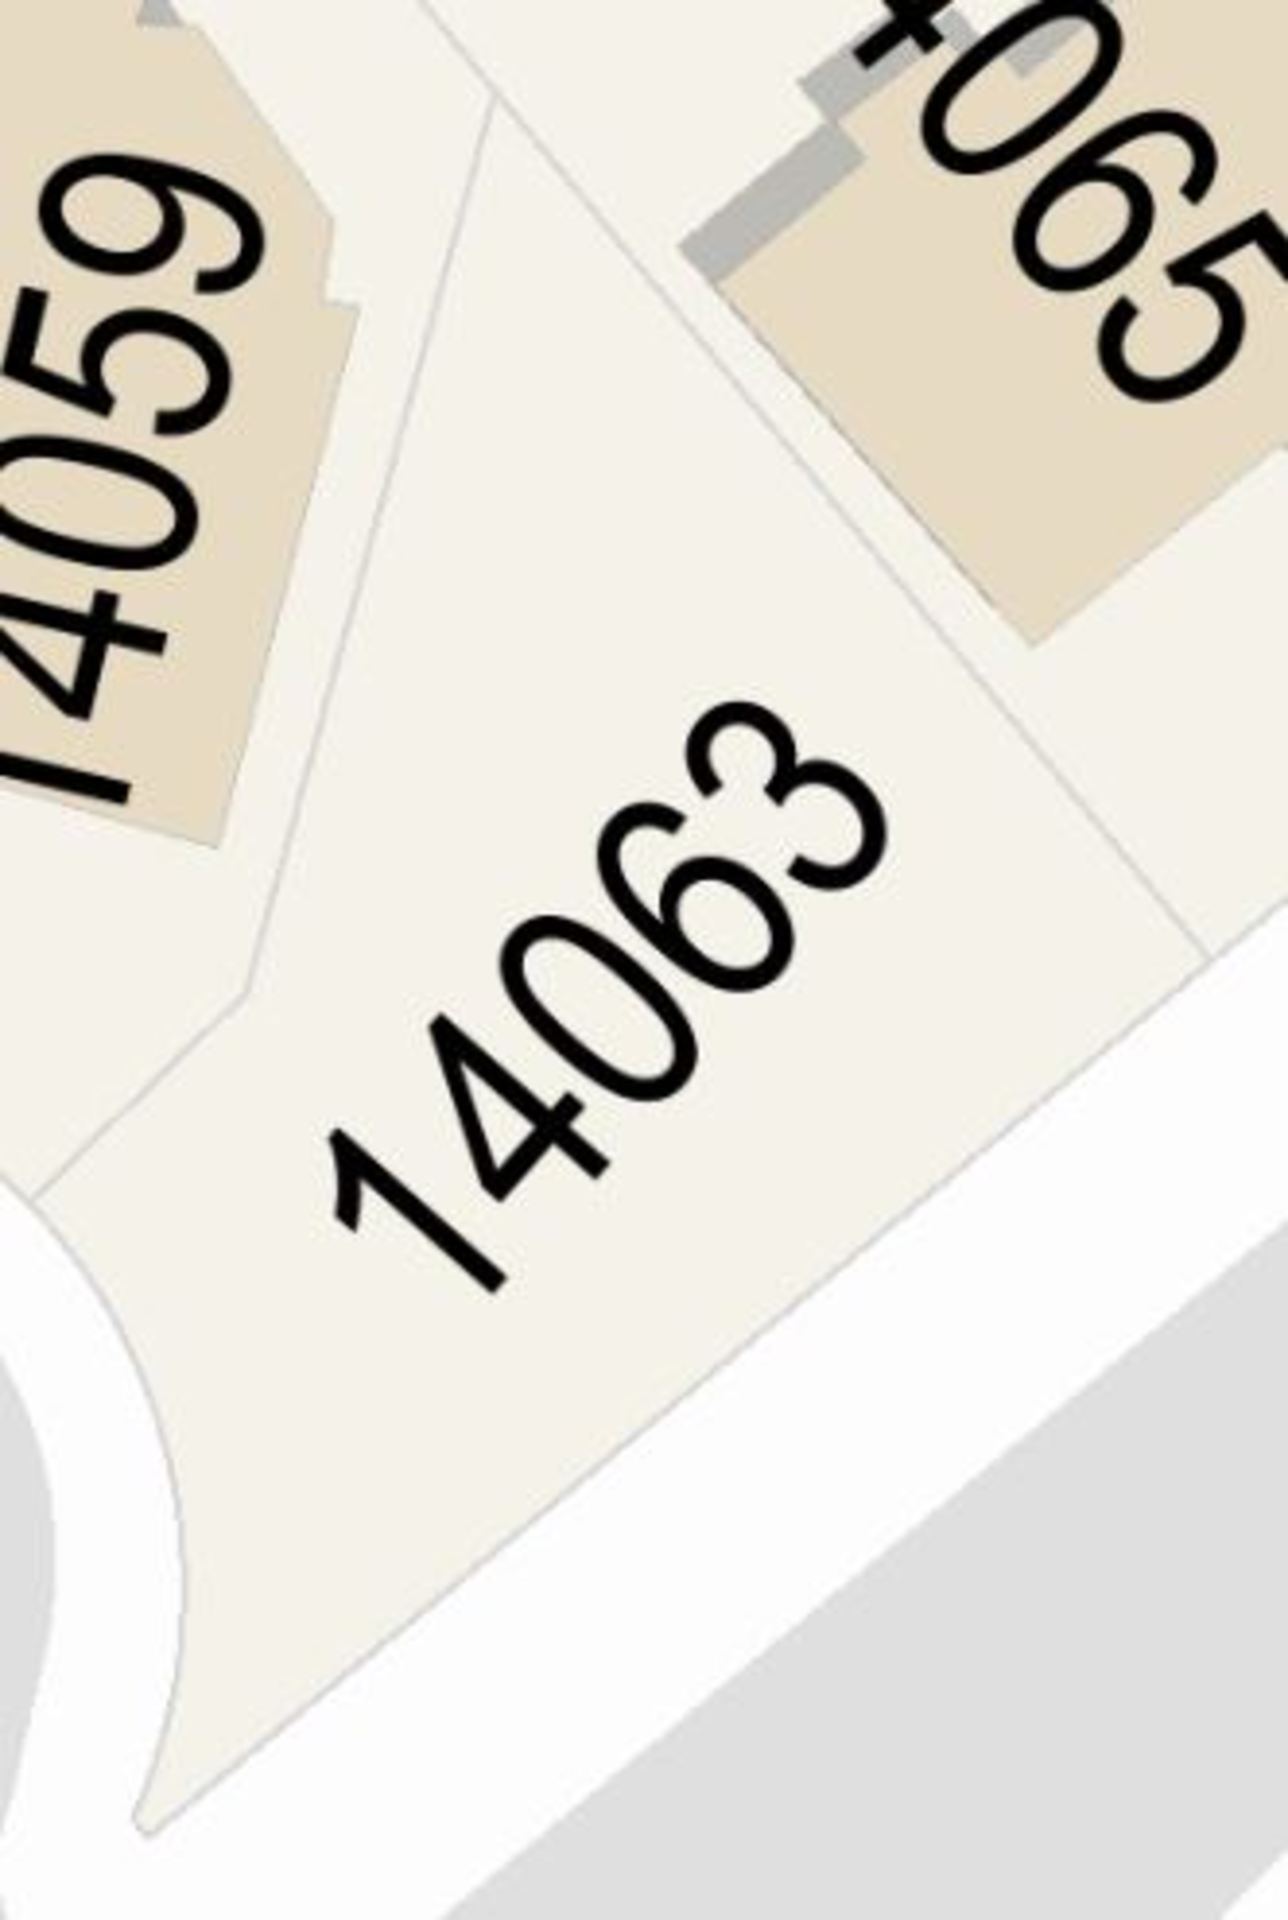 14063-Grosvenor at 14063 Grosvenor Road, Bolivar Heights, North Surrey